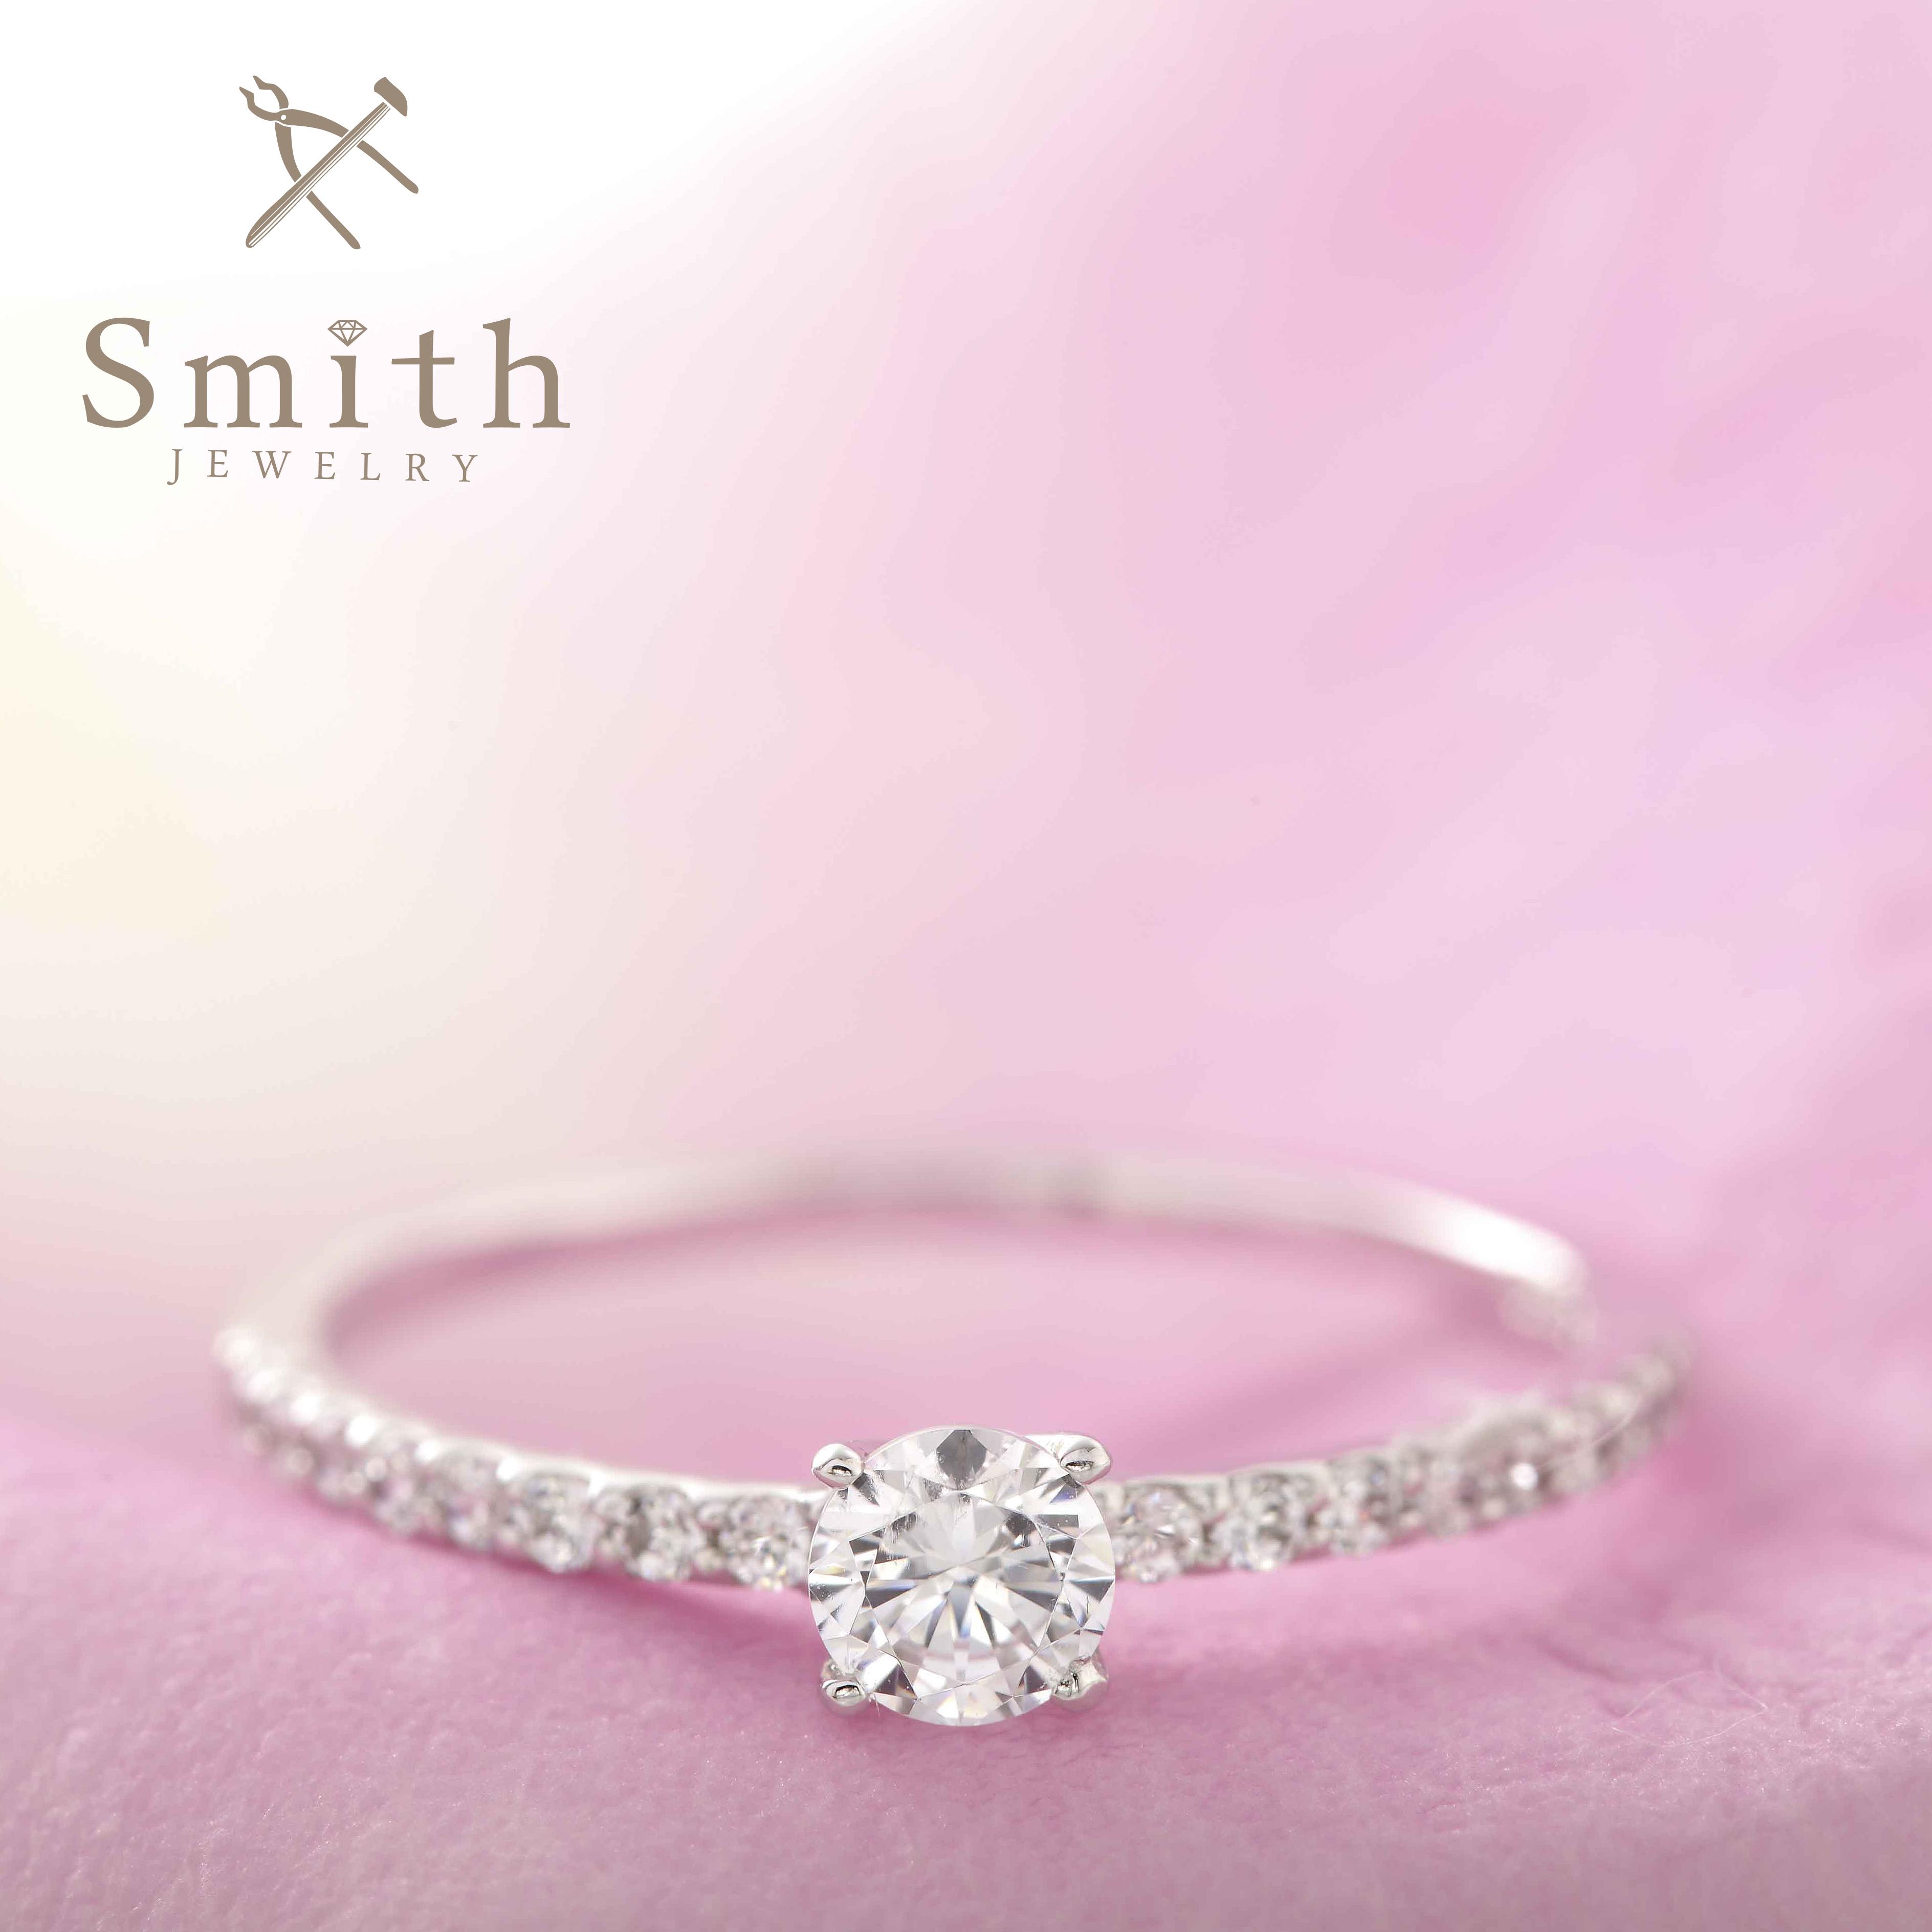 【Smith】オーダーメイド婚約指輪 華奢エタニティーにメインダイヤがキラリ!理想の指輪